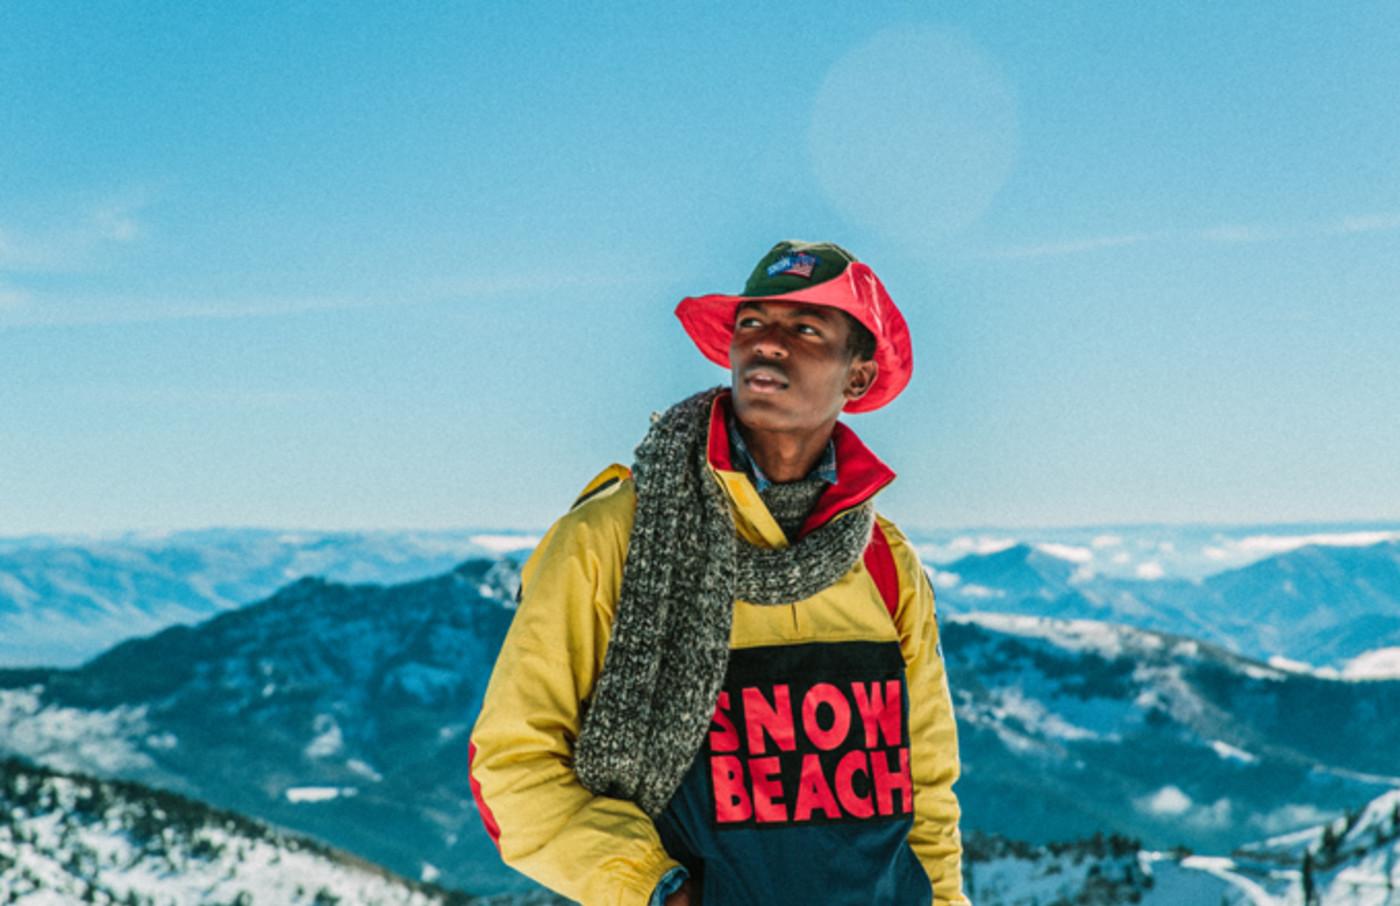 Polo Snow Beach